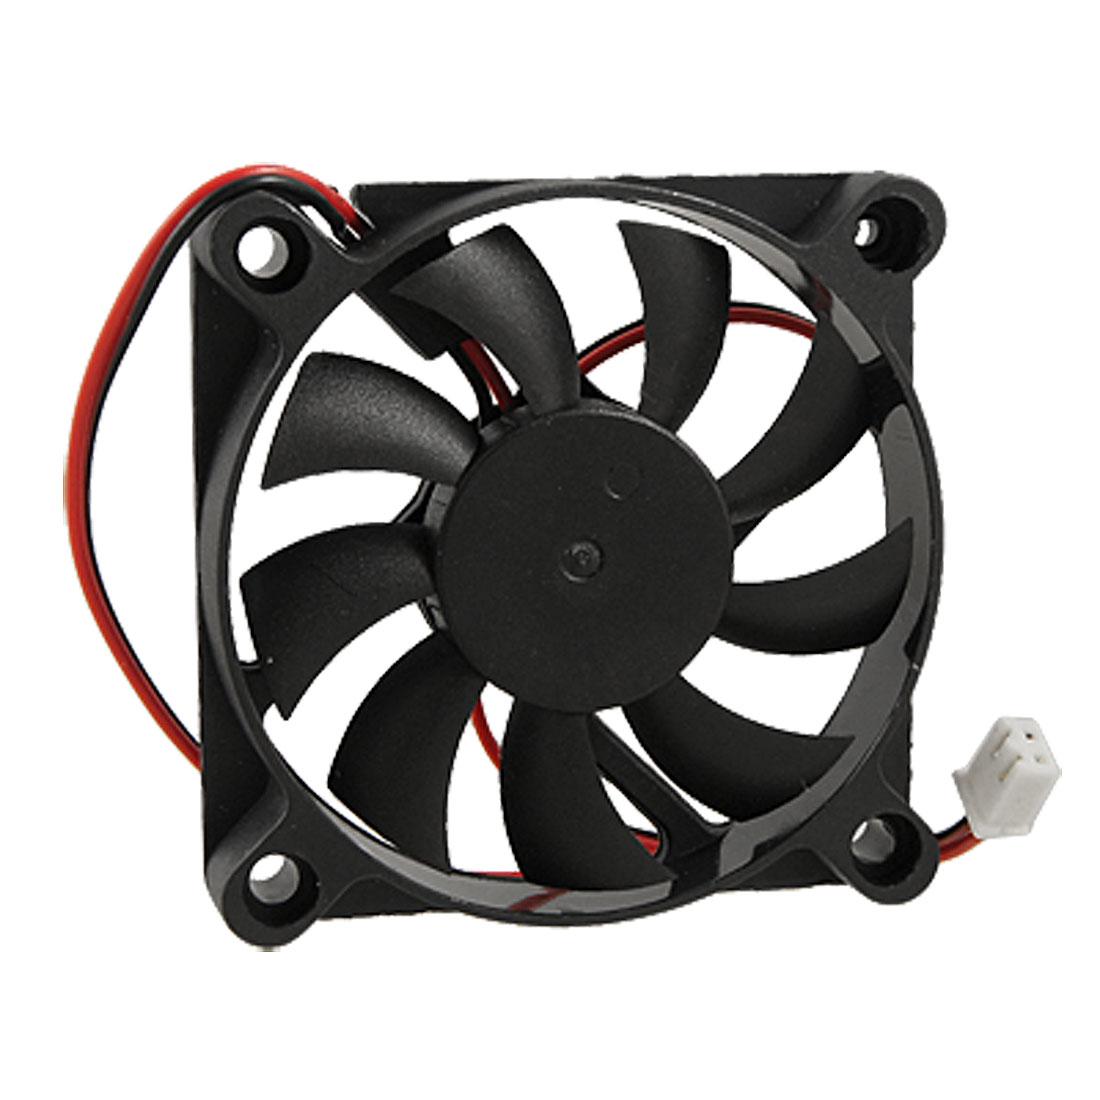 YOC Hot Desktop PC Case DC 12V 0.16A 60mm 2 Pin Cooler Cooling Fan